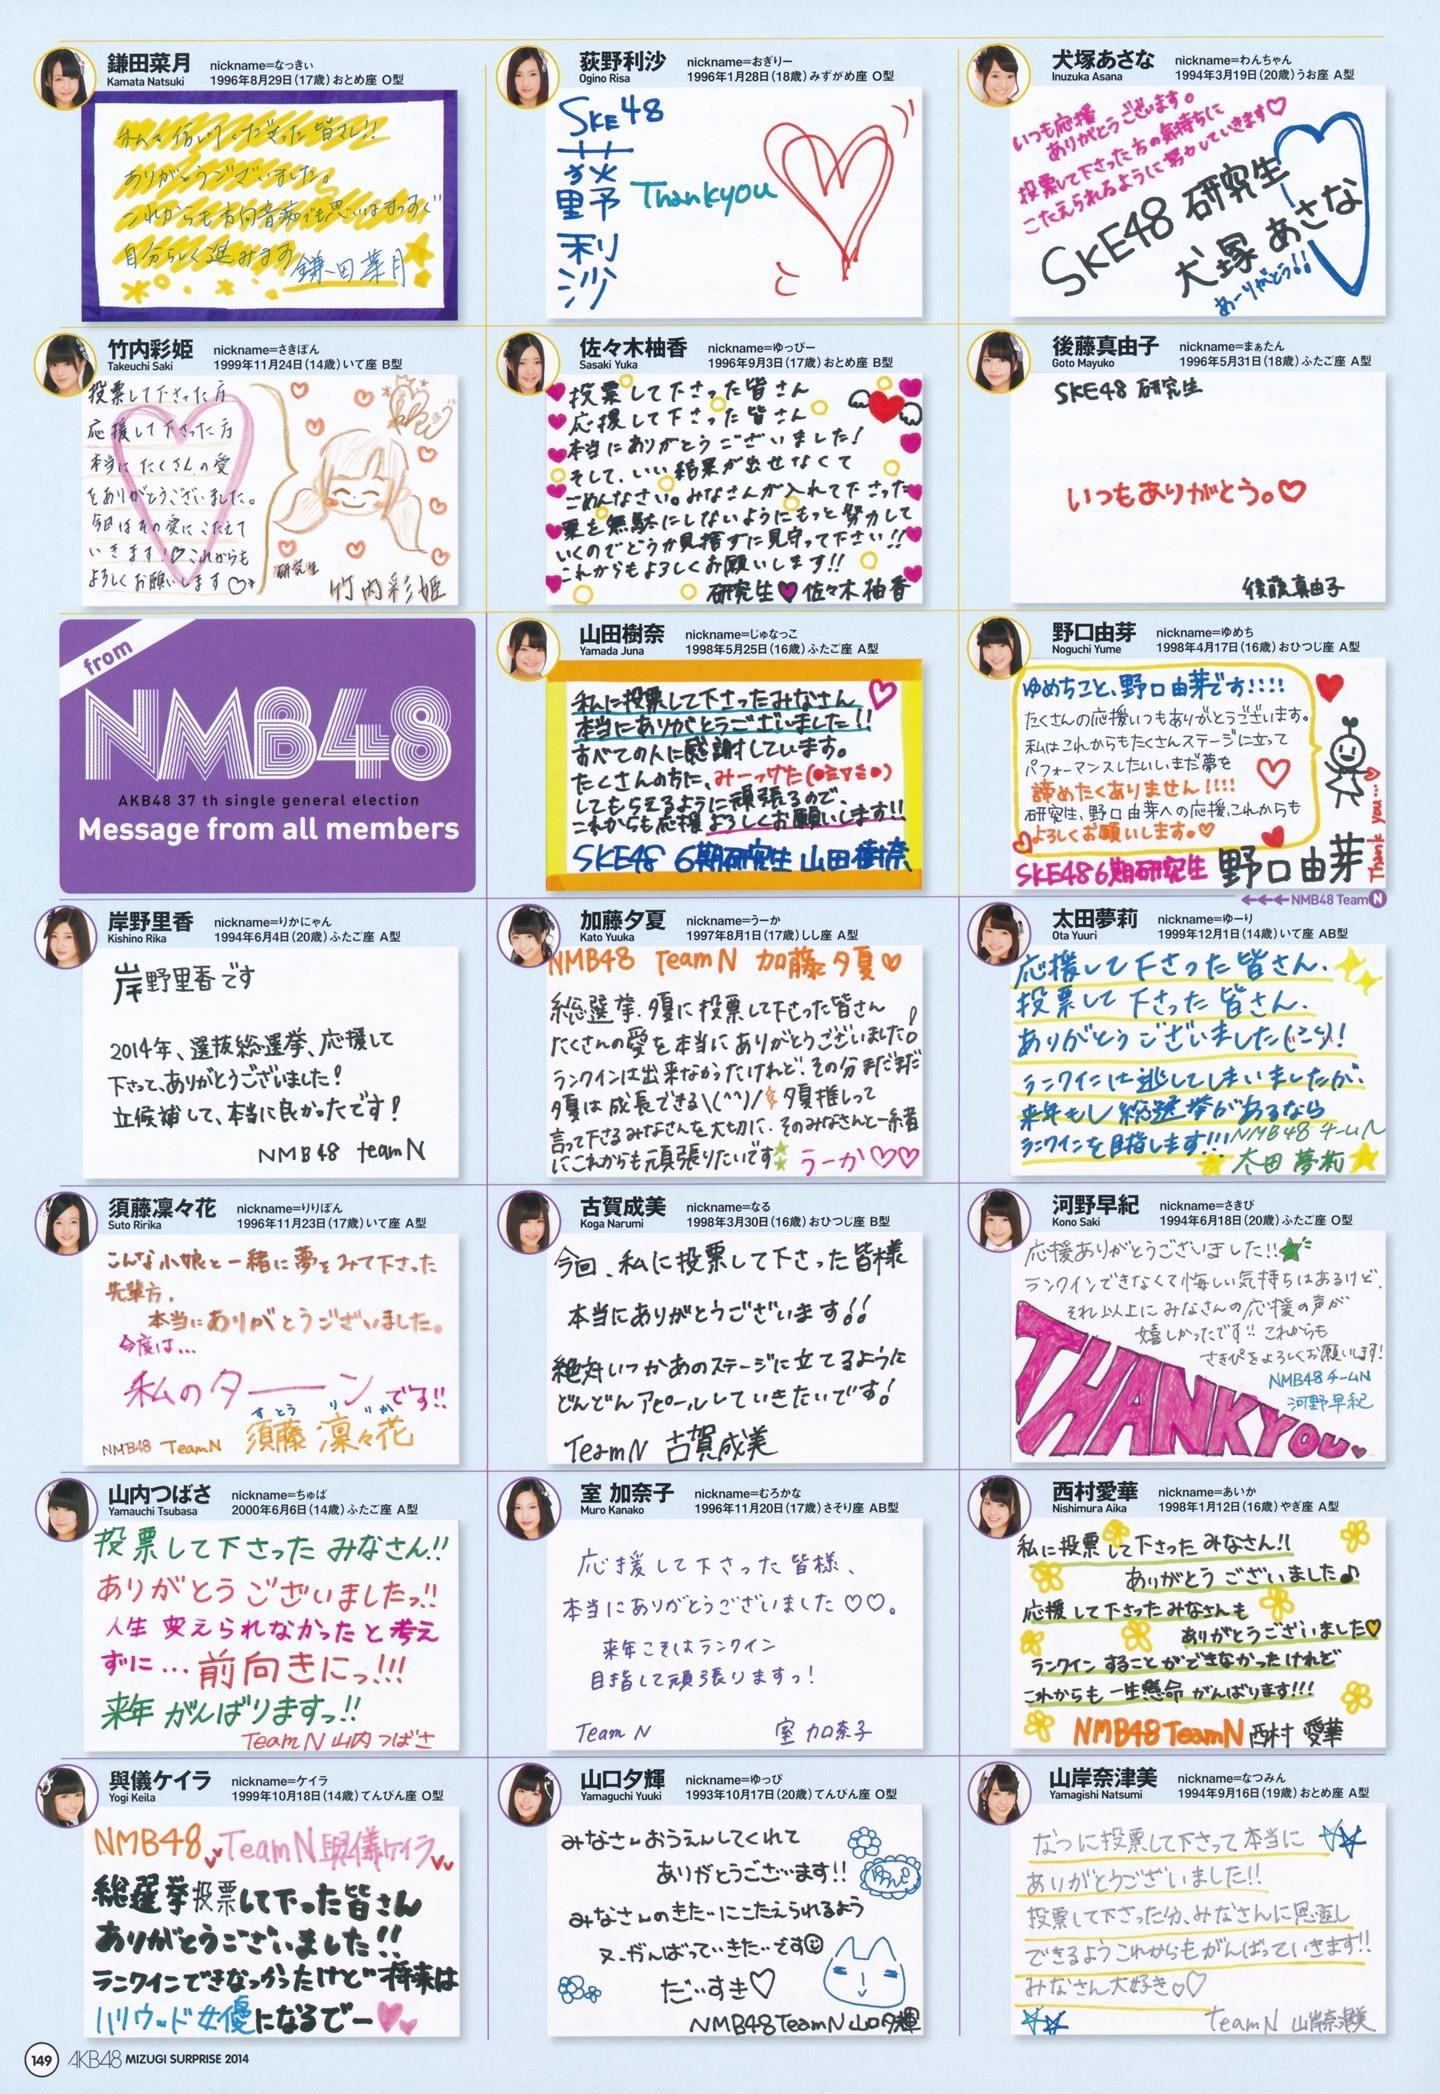 AKB48人気メンバー 画像 136